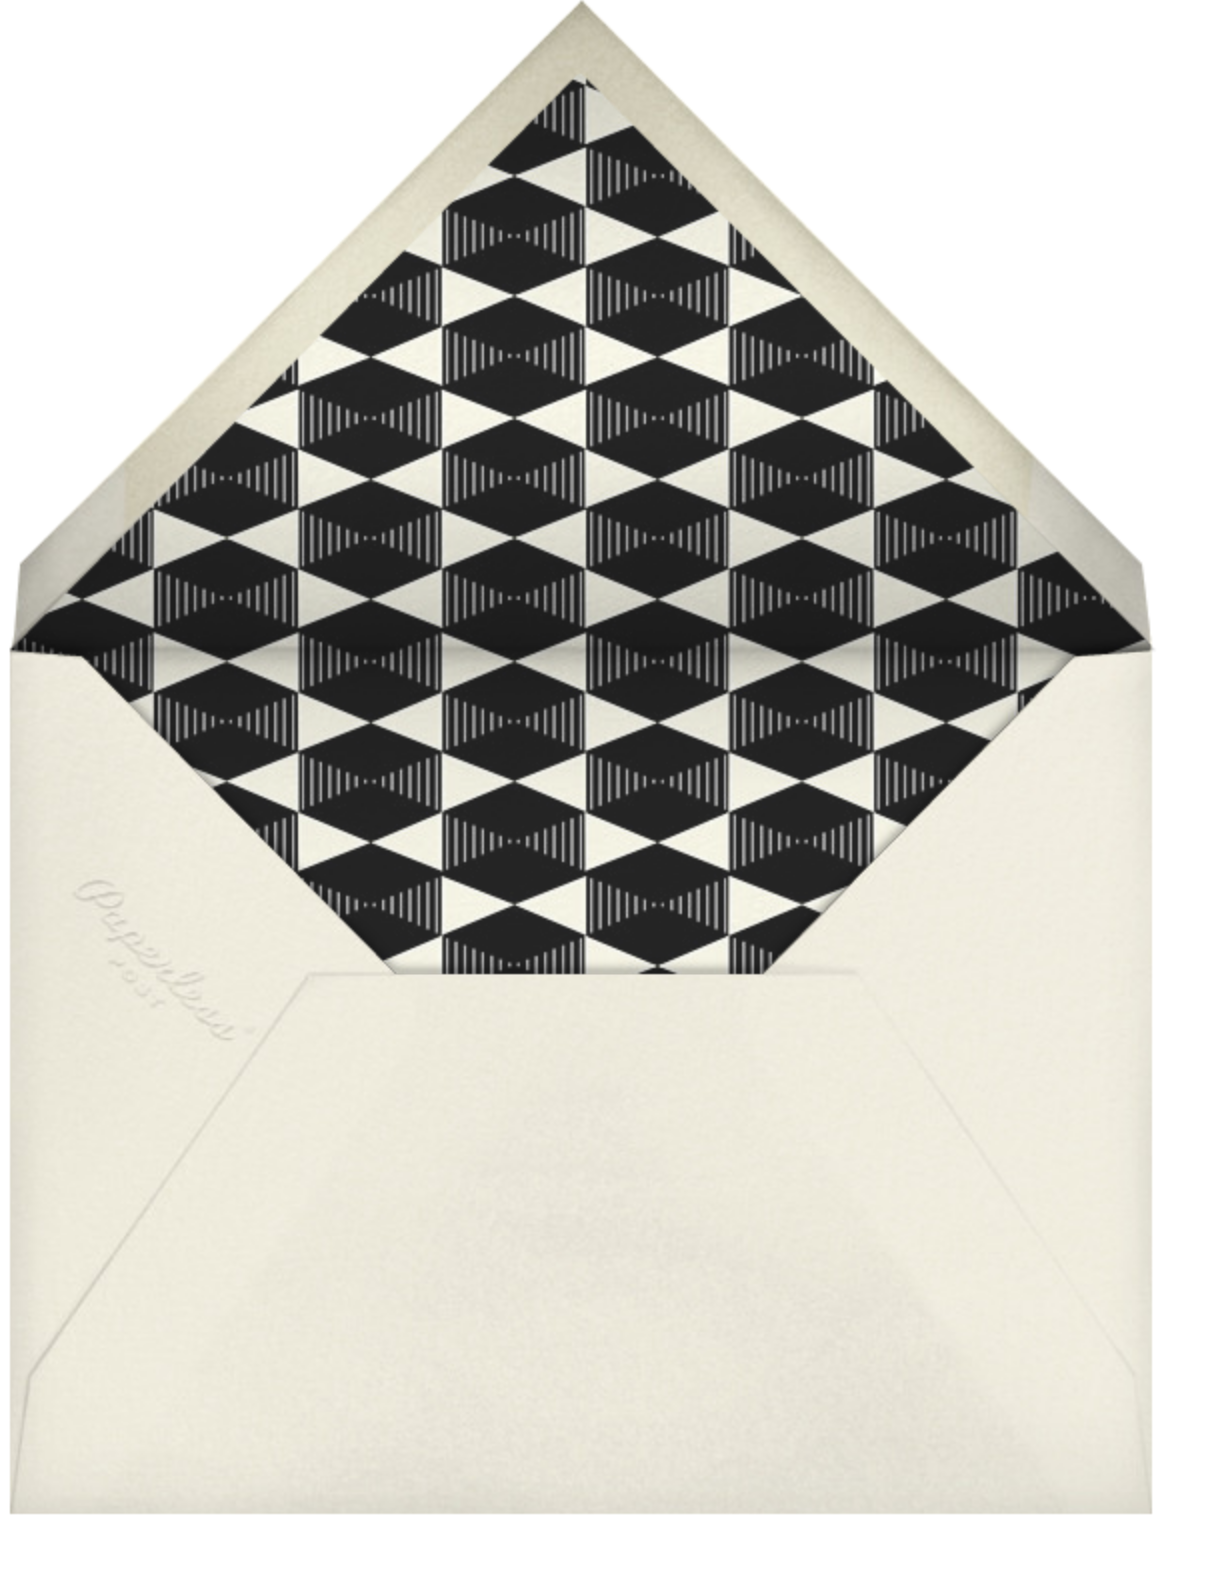 Plaza Square - Cream - Paperless Post - Moving - envelope back